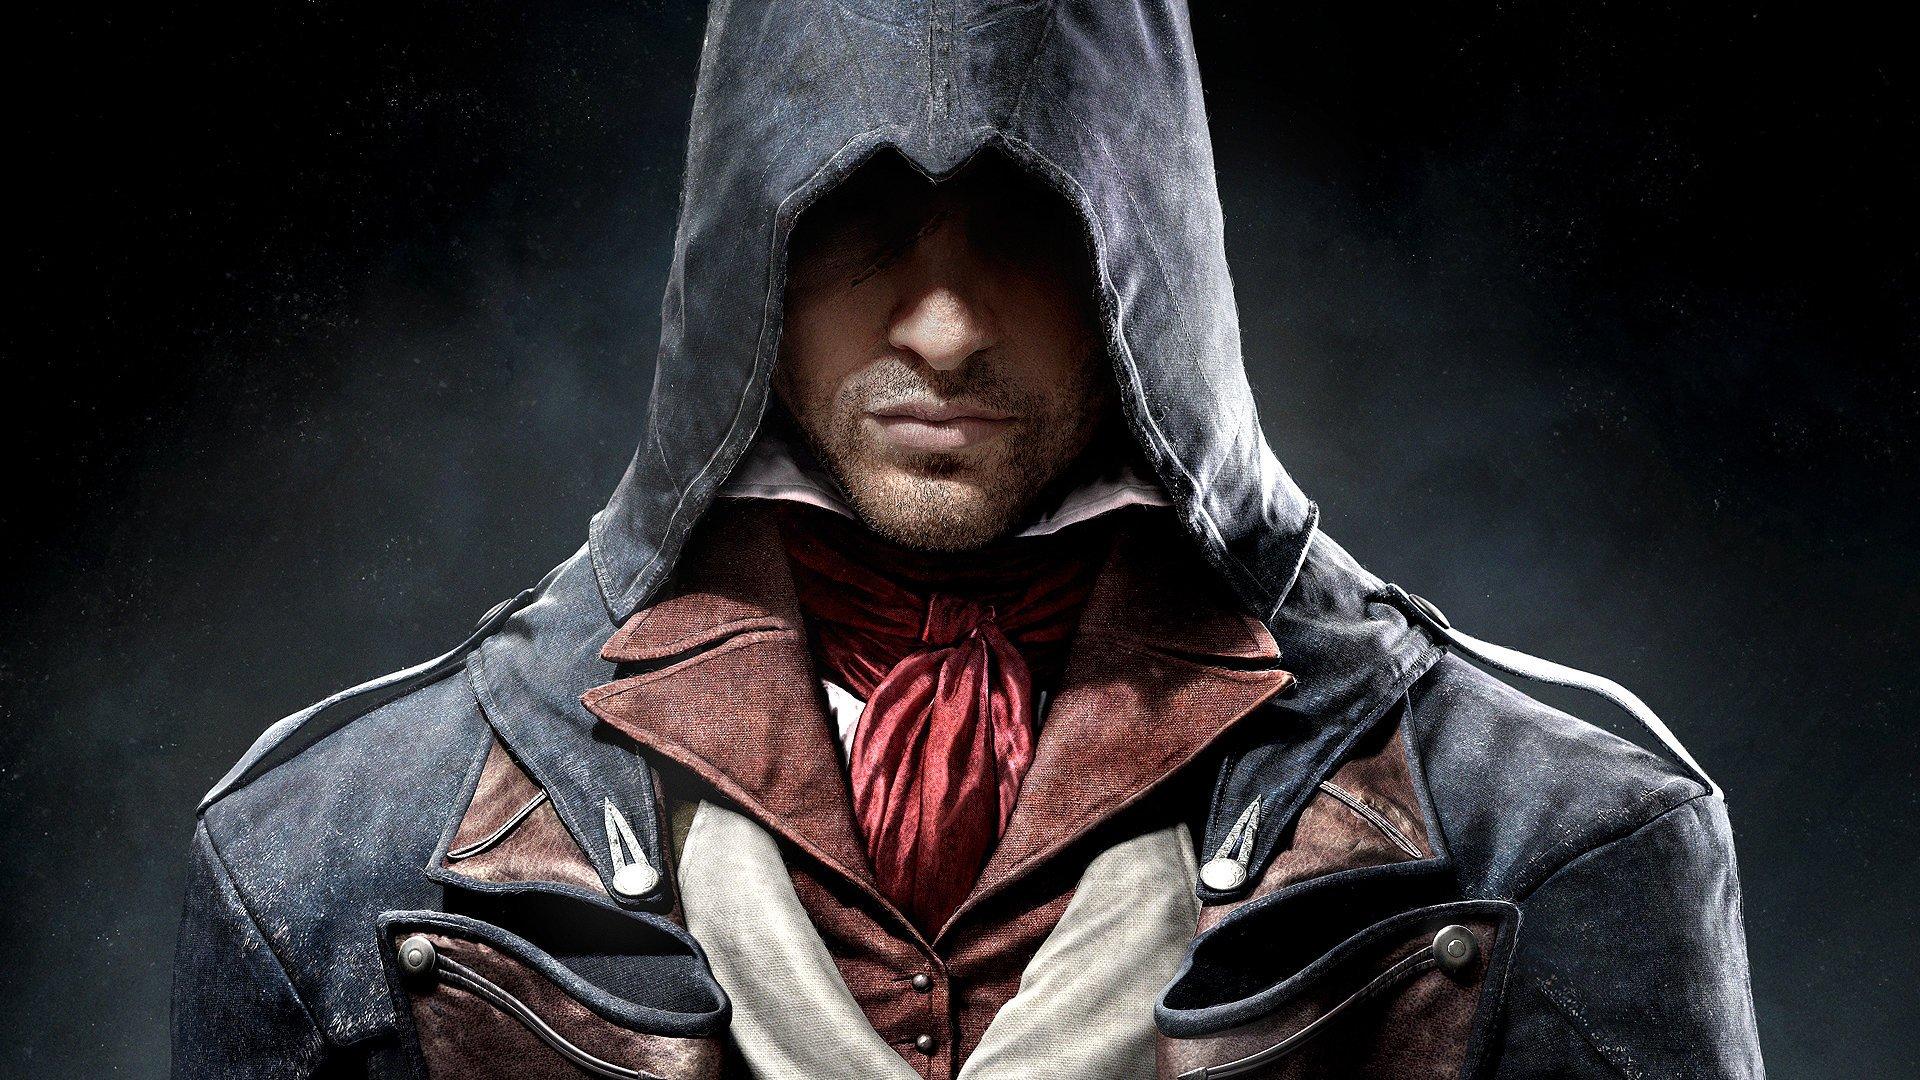 Preview Assassin's Creed Unity - Do ohniska francouzské revoluce 9737